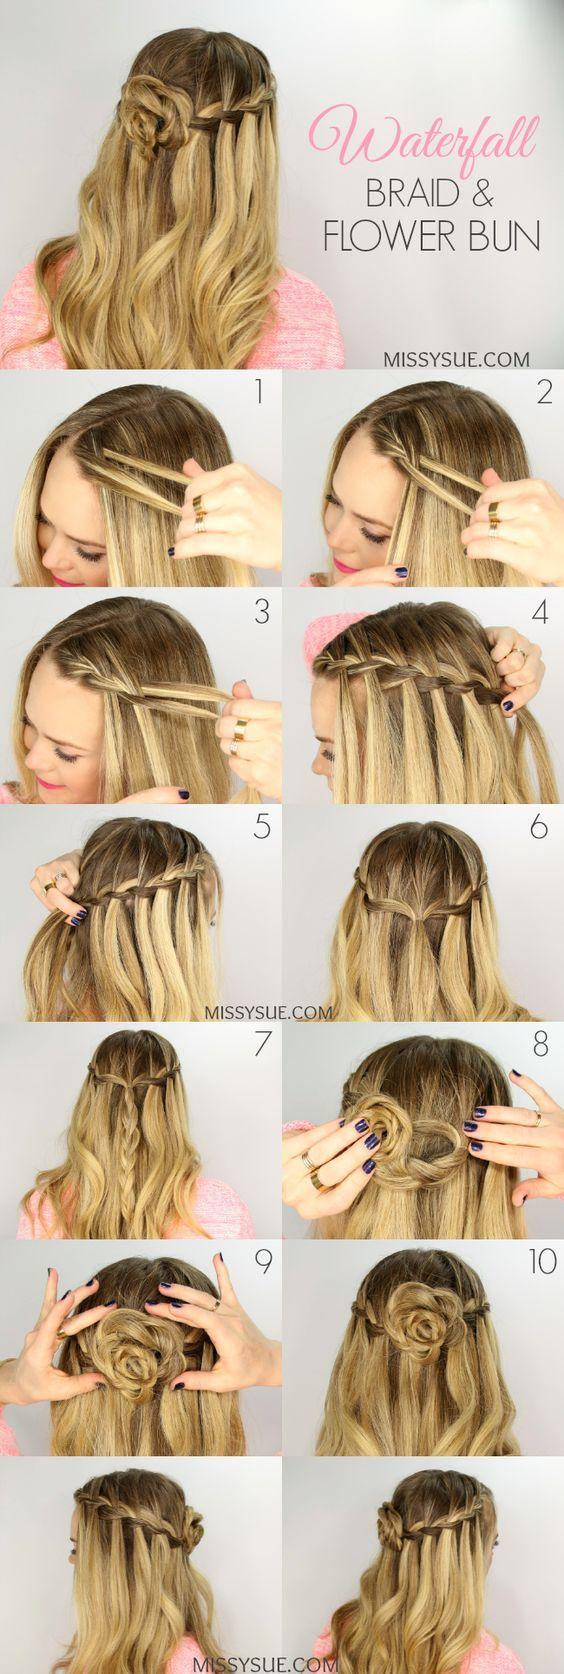 Waterfall Braid and Flower Bun tutorial / http://www.himisspuff.com/easy-diy-braided-hairstyles-tutorials/82/